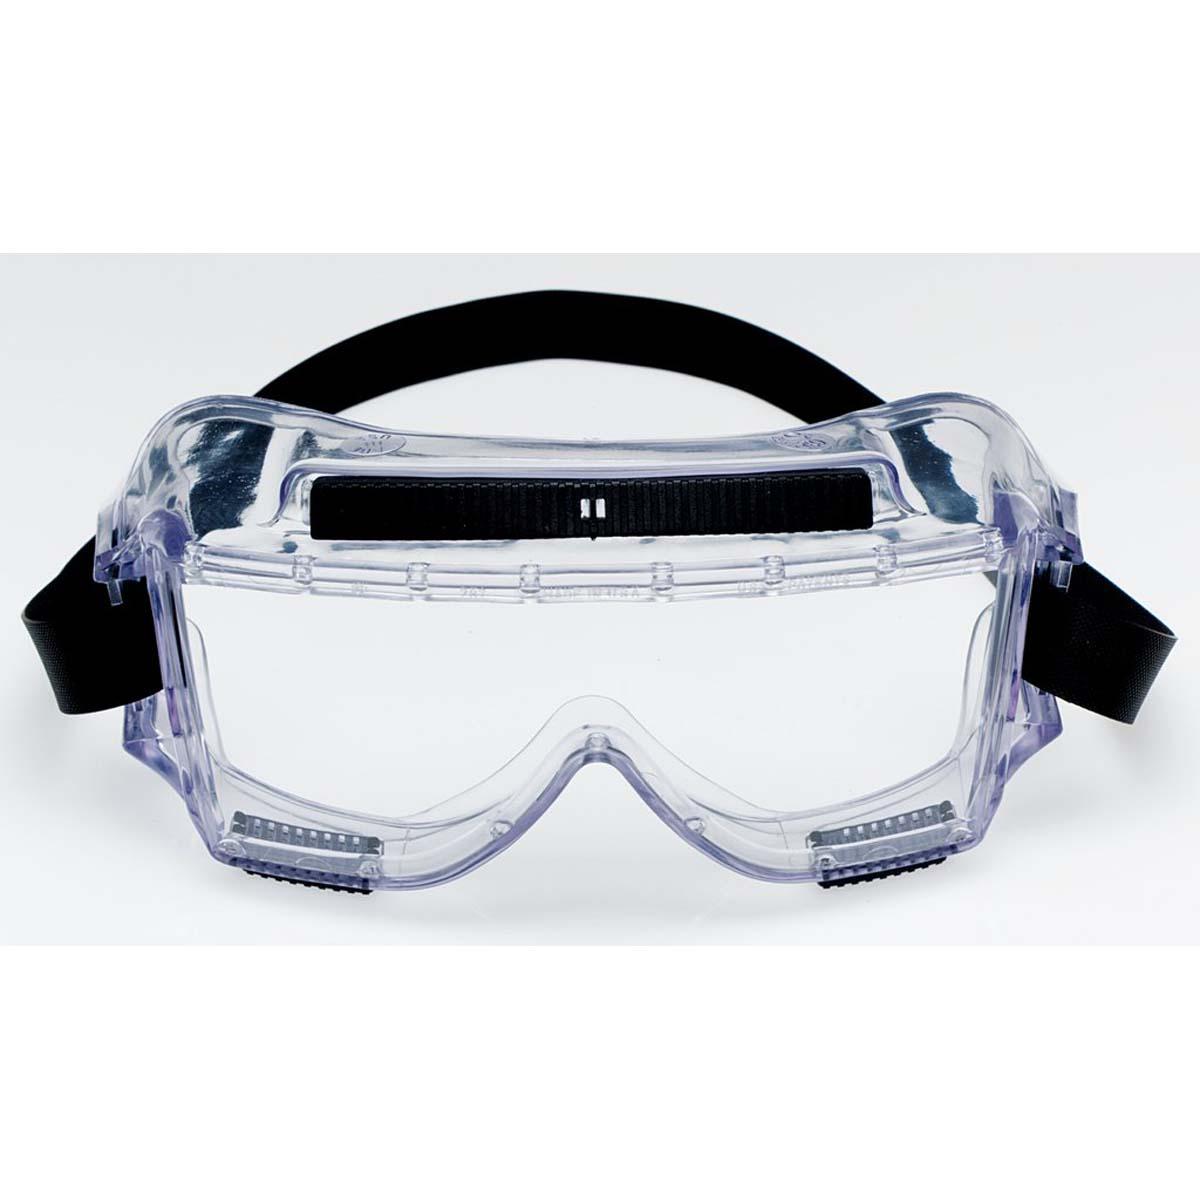 "3Mâ""¢ Centurionâ""¢ Splash Safety Goggles 454, 40304-00000-10 Clear Lens,"